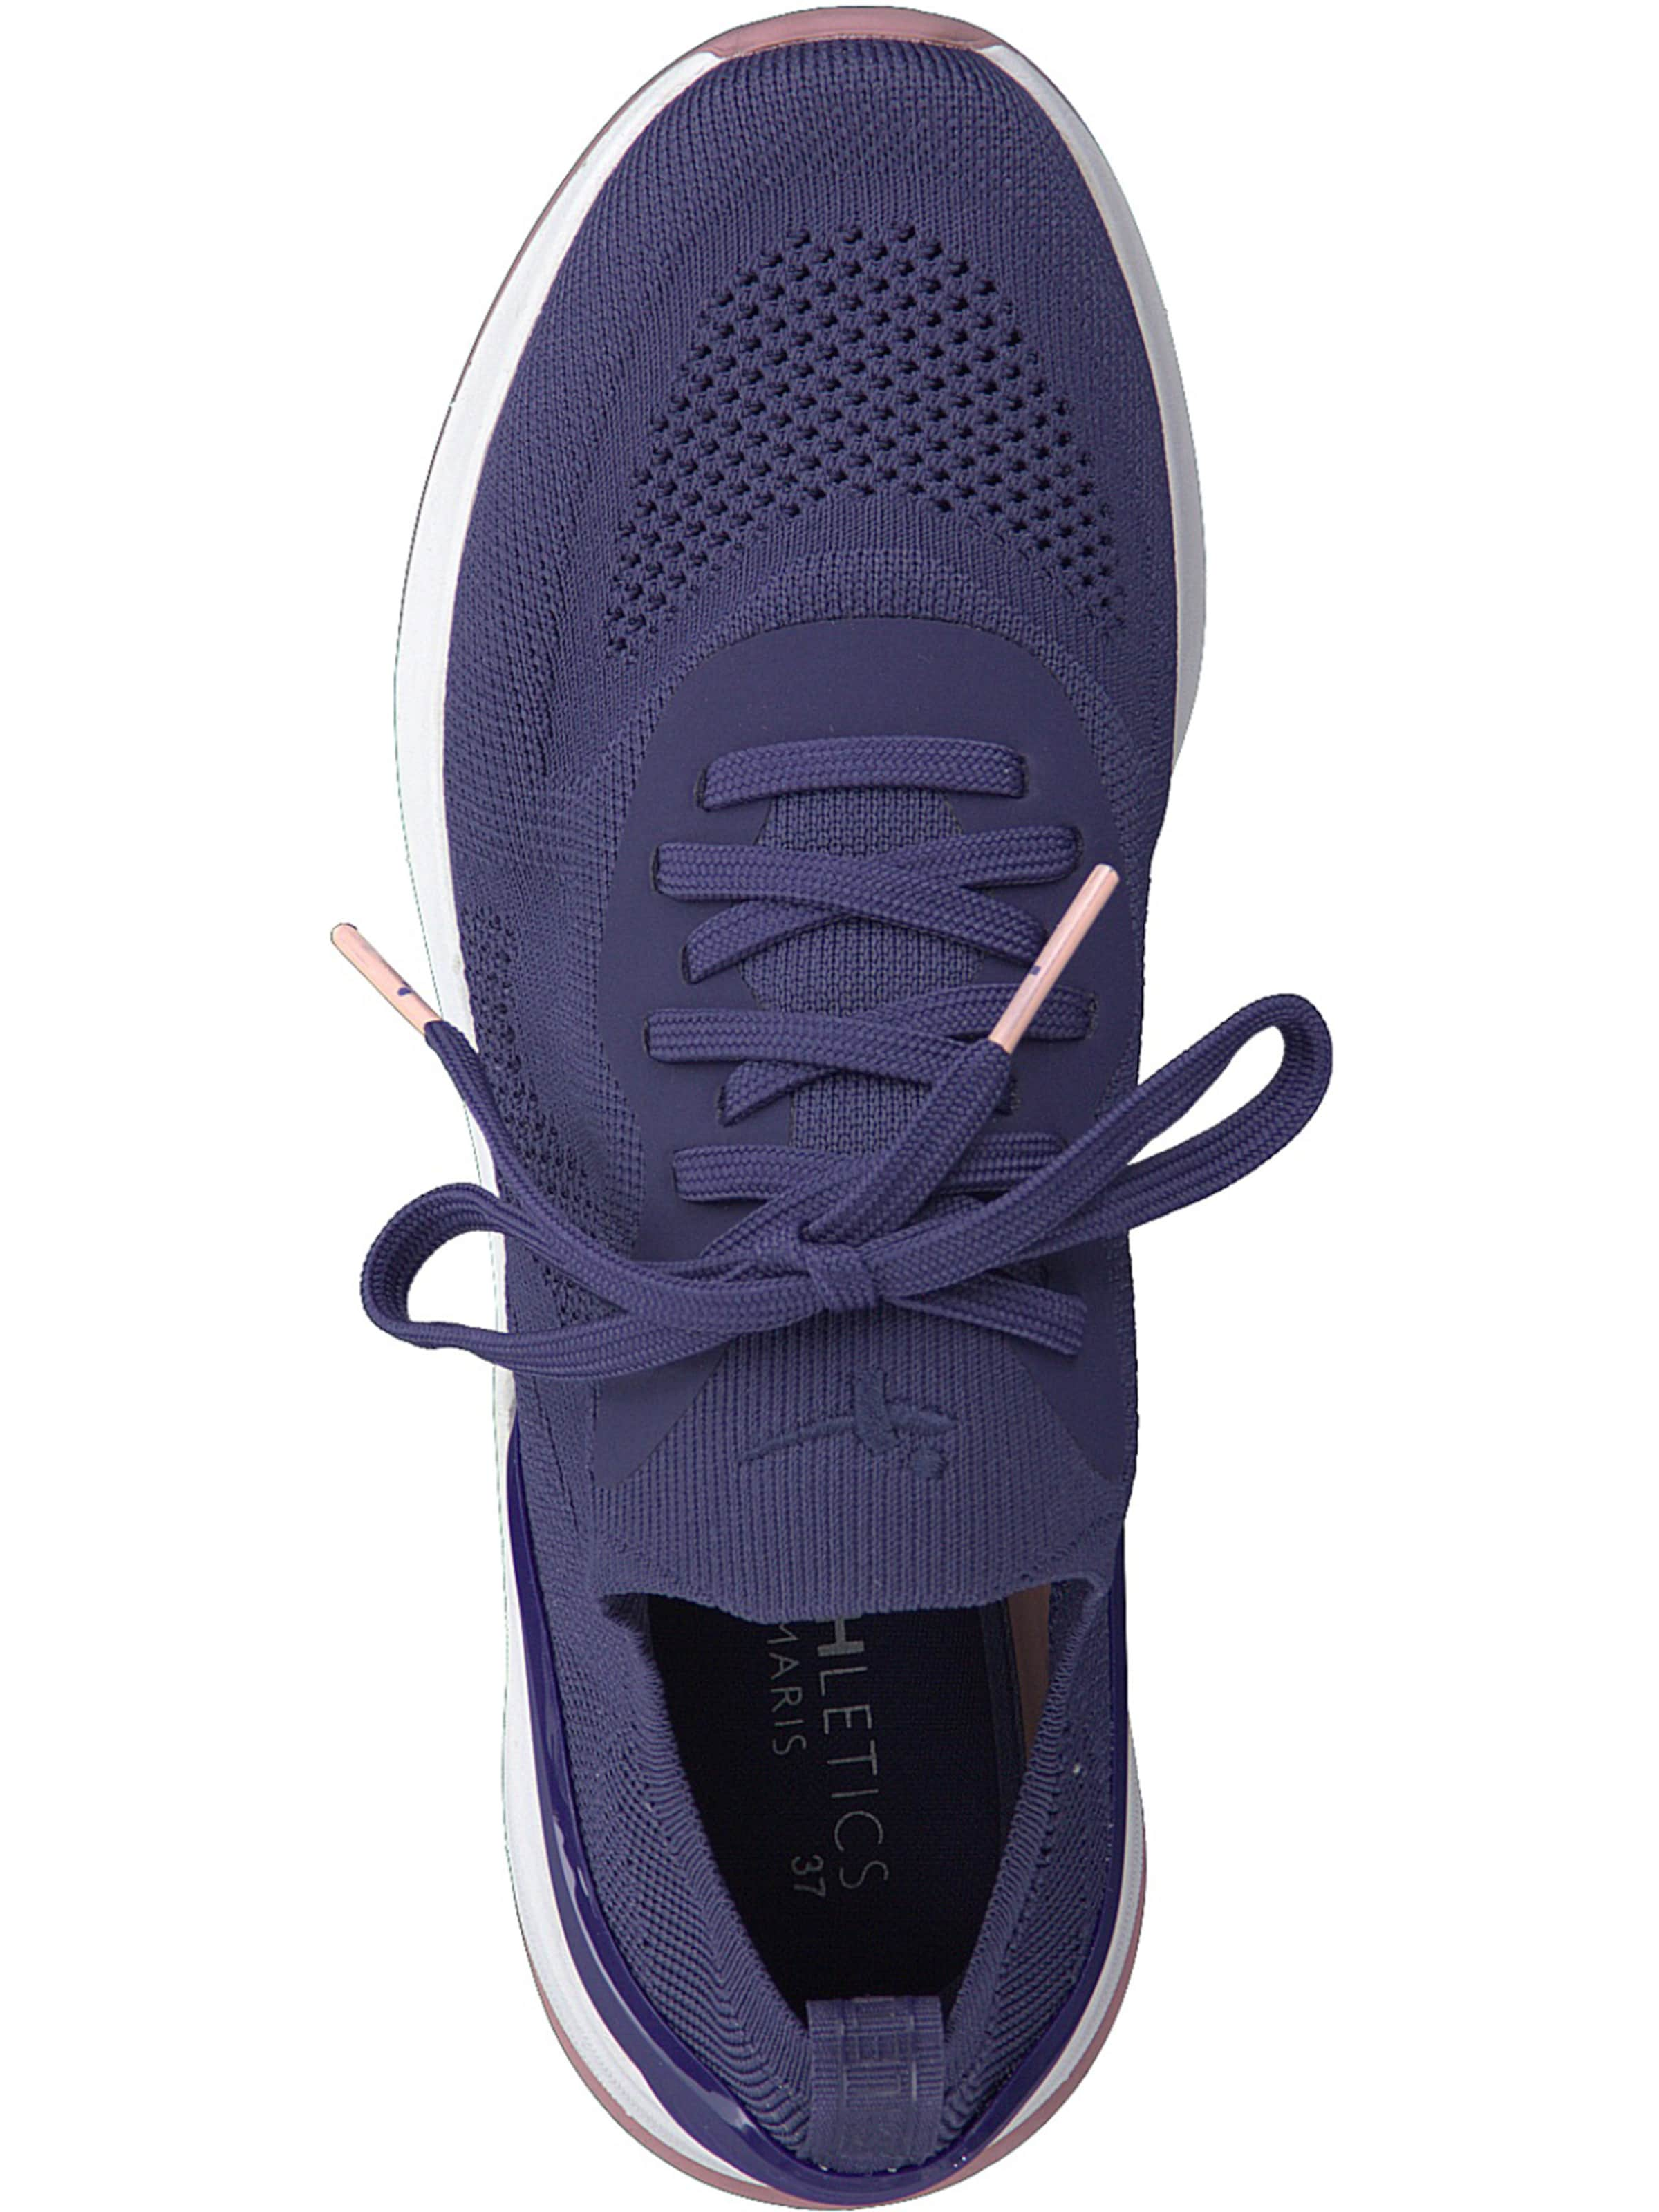 Baskets Bleu 'flyknit' En Basses Tamaris hrCtdsQ